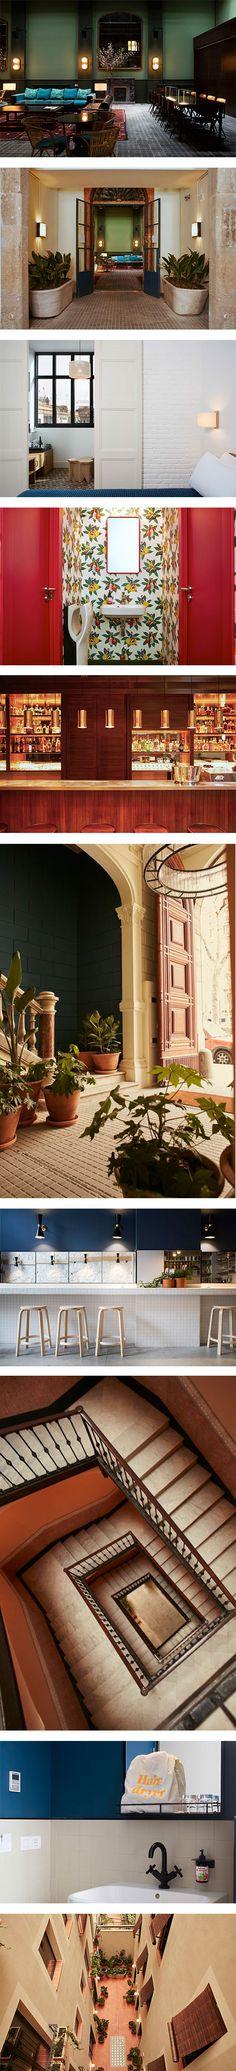 Casa Bonay: A very cool hotel in the heart of Barcelona on Nuji.com #casabonay #hotel #barcelona